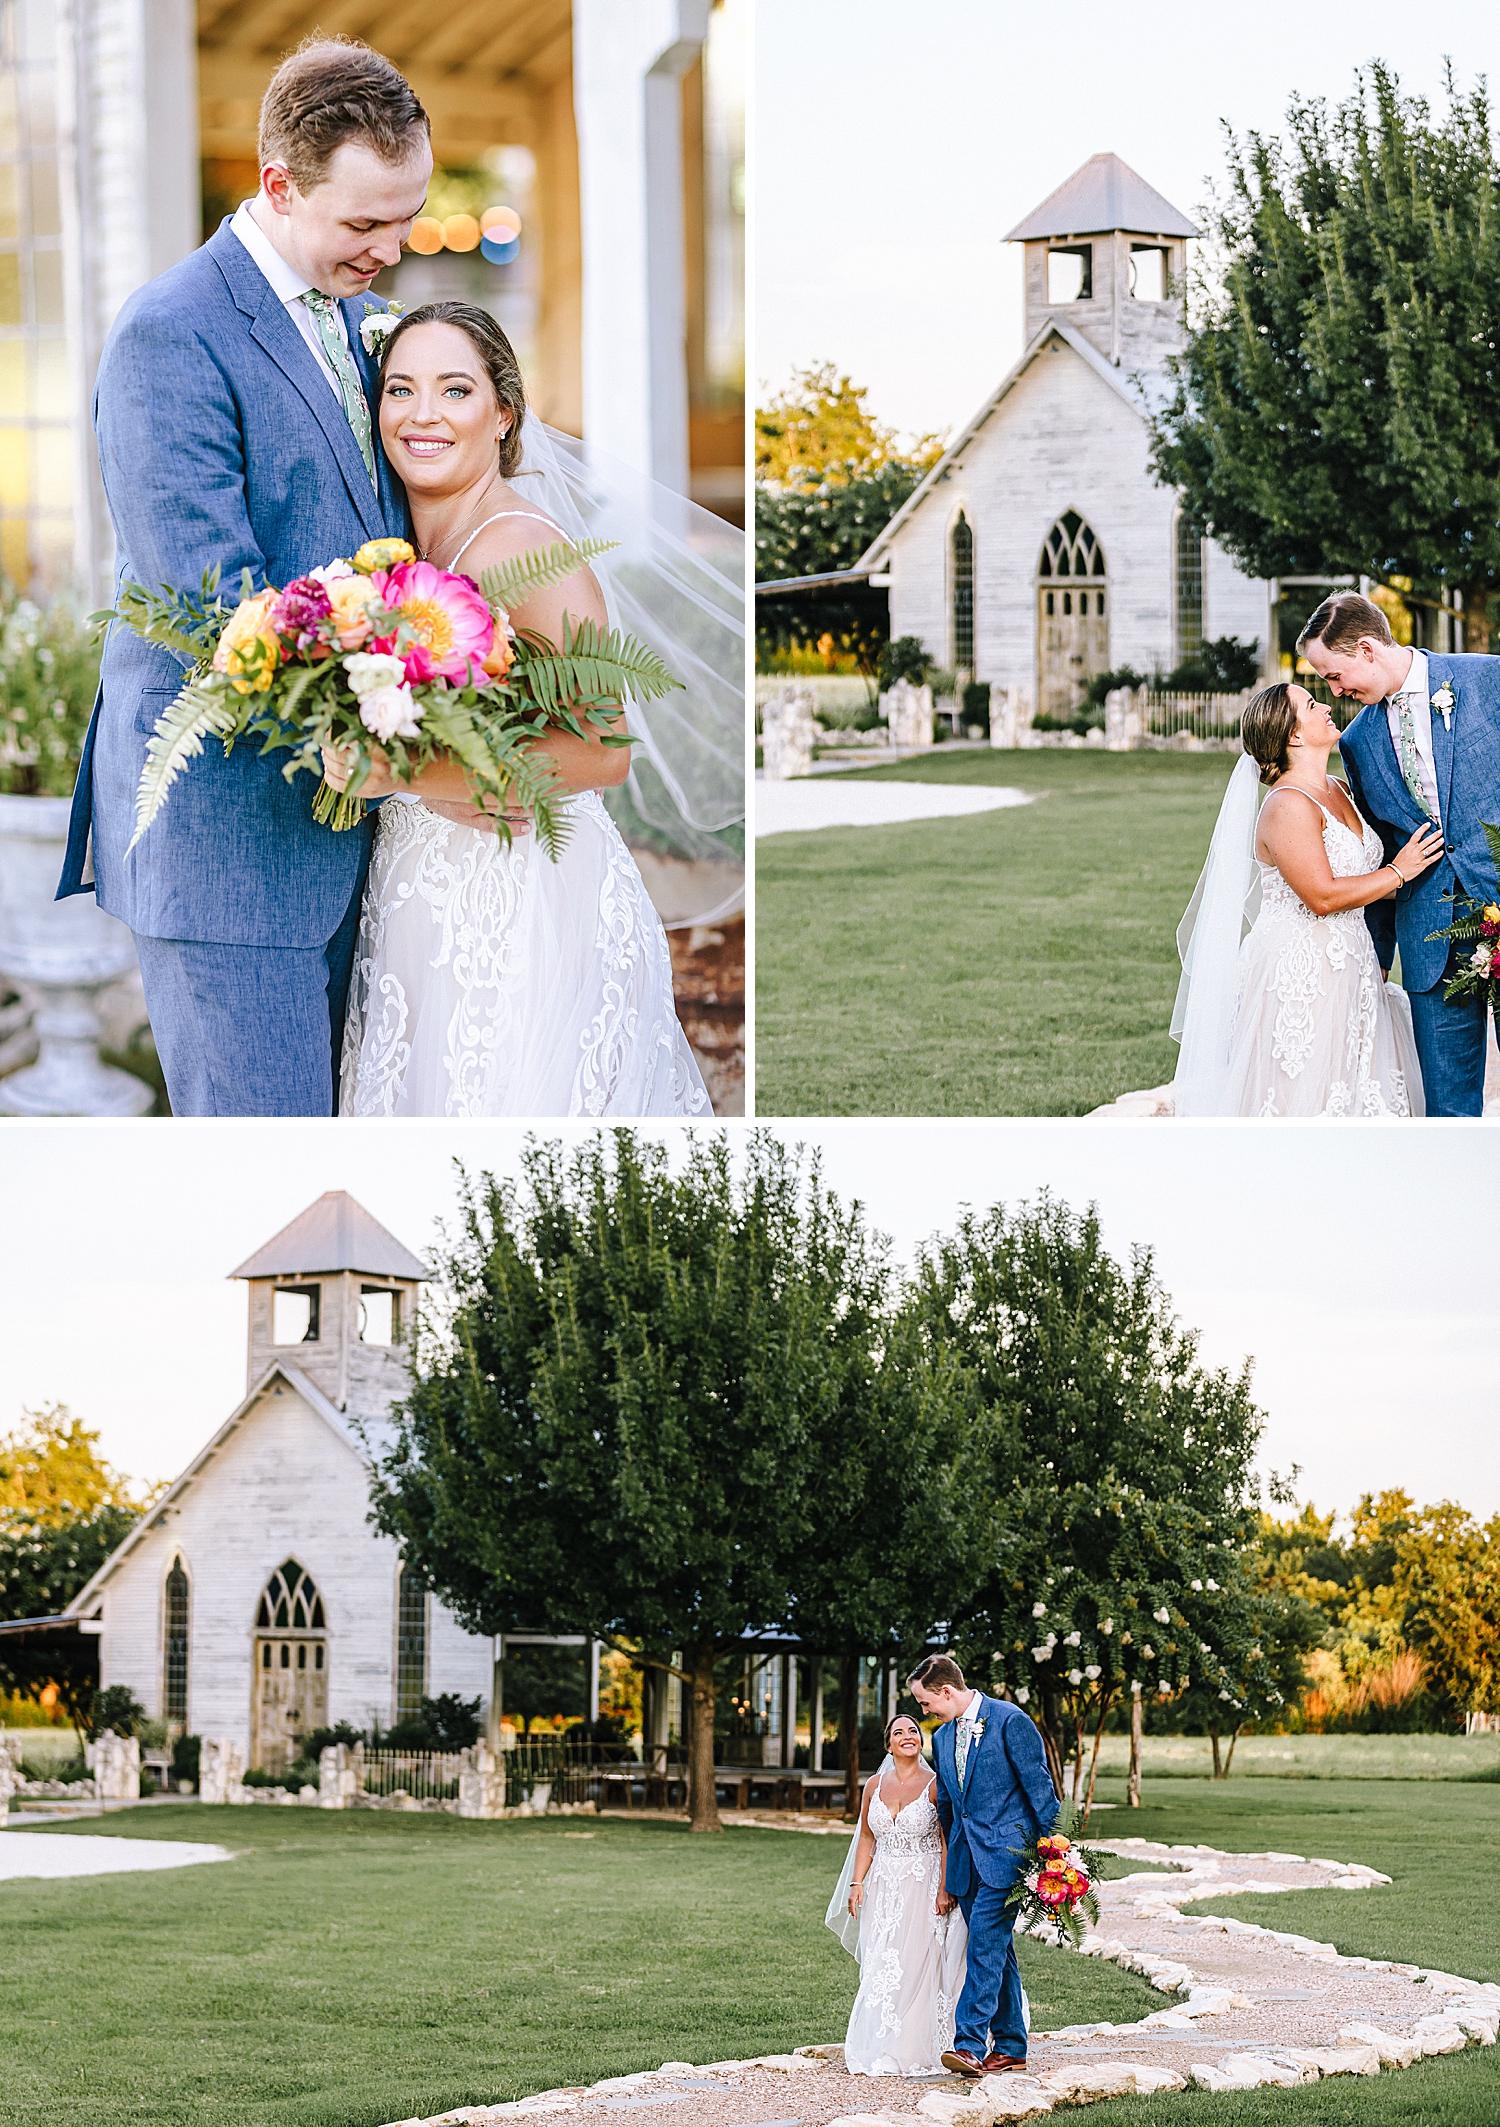 Gruene-Estate-Wedding-New-Braunfels-Bride-Wedding-Photos-Carly-Barton-Photography_0131.jpg